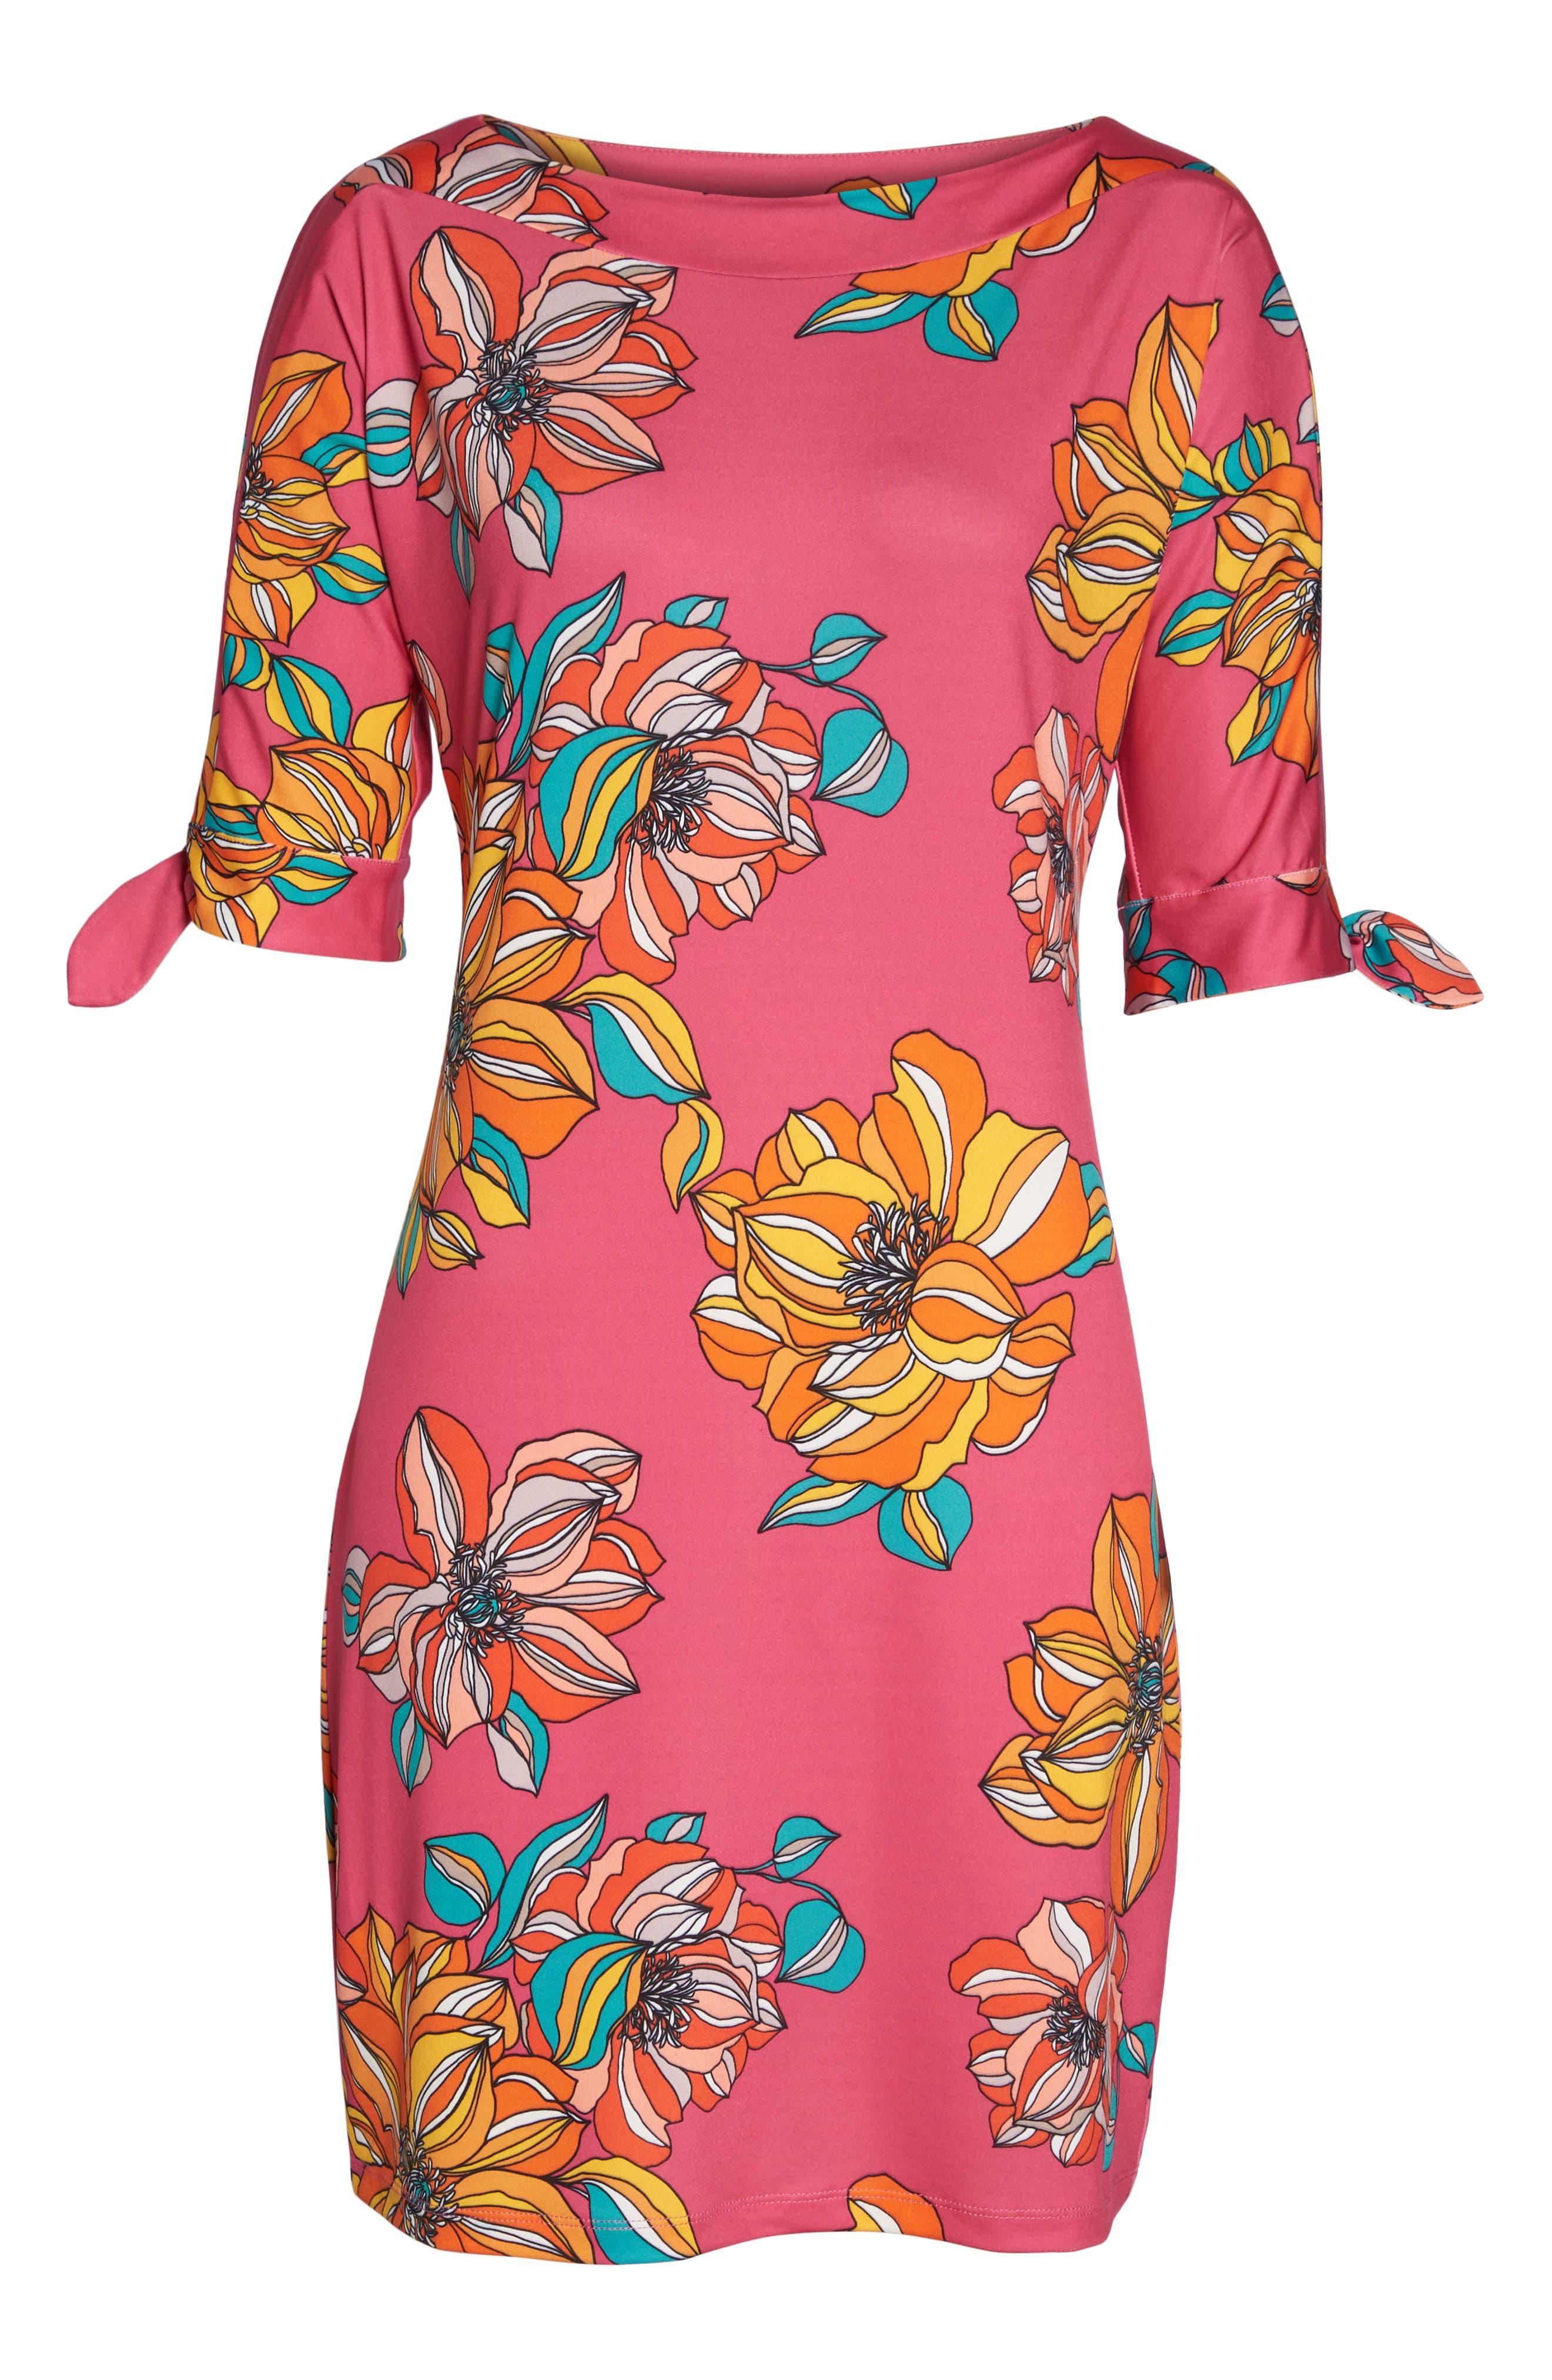 Vinet Floral Jersey Dress,                             Alternate thumbnail 6, color,                             650